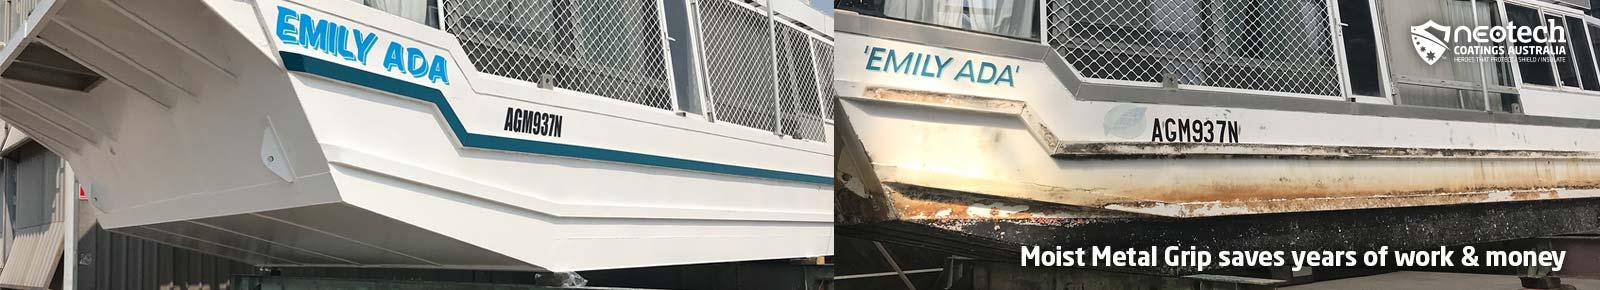 NEOtech Coatings Australia Moist Metal Grip Houseboat